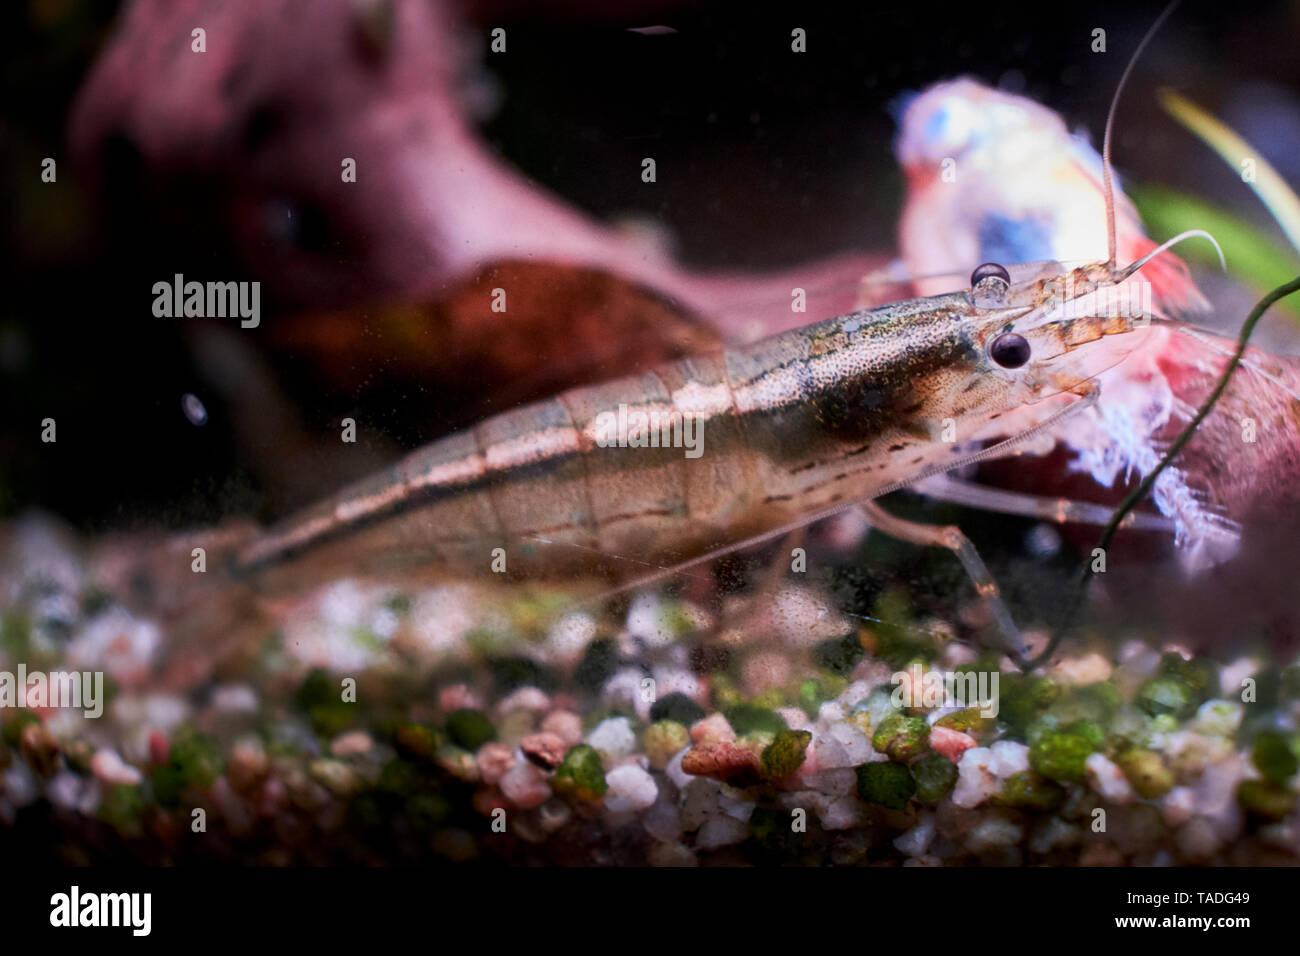 An Amano shrimp feeding on a dead red phantom tetra in a home aquarium. - Stock Image